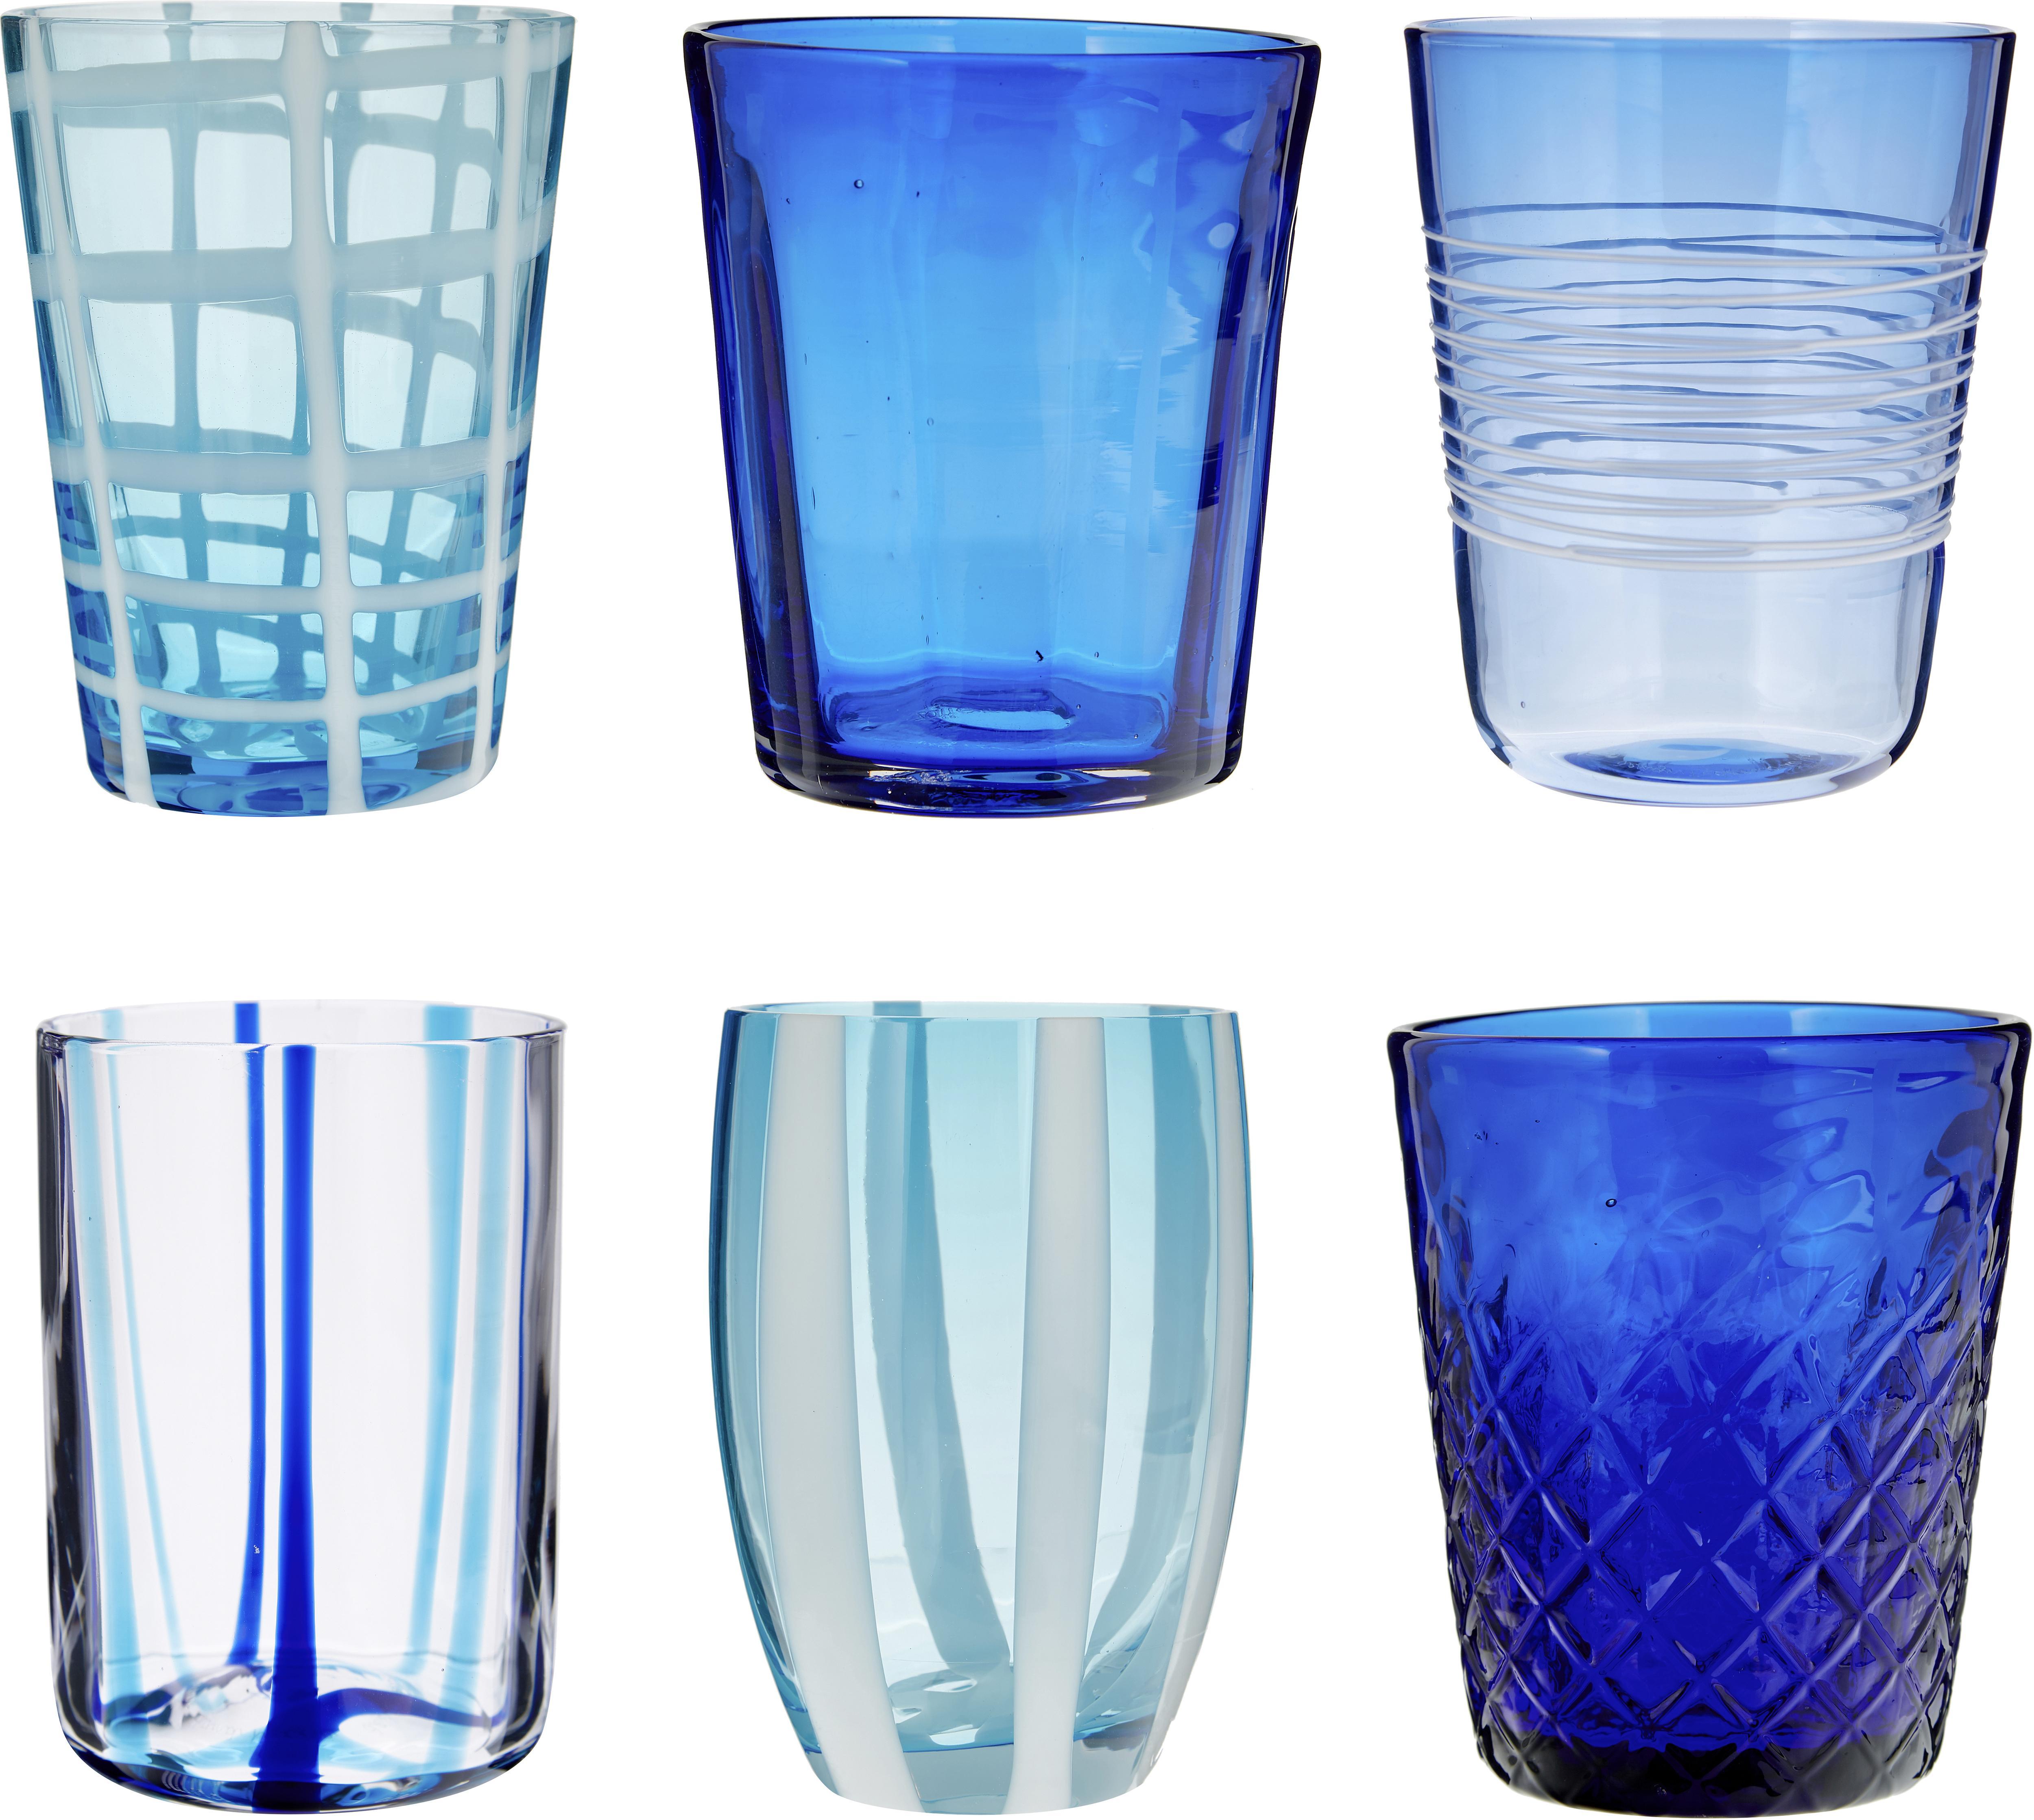 Vasos de vidrio soplado Melting Pot Sea, 6uds., Vidrio, Azul, transparente, Tamaños diferentes